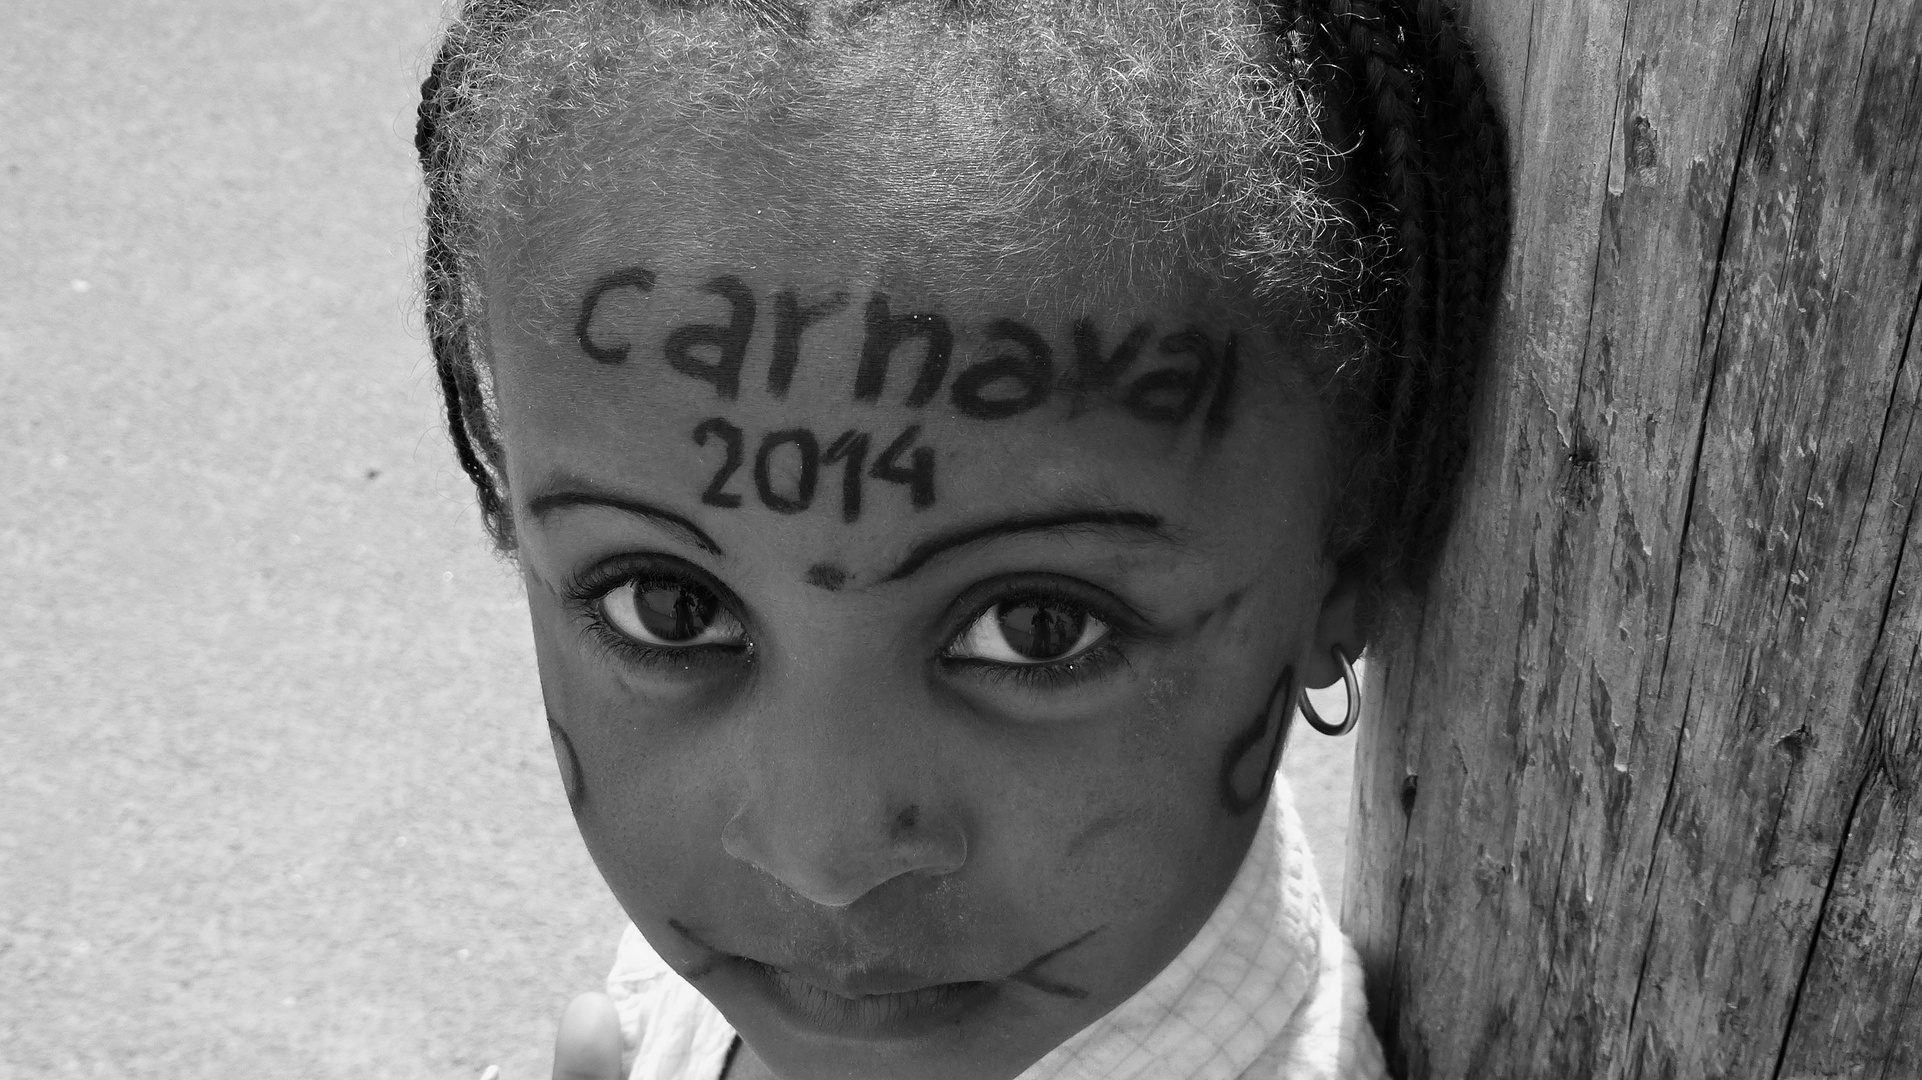 Carnaval 2014 - Sao Vicente, Kapverden